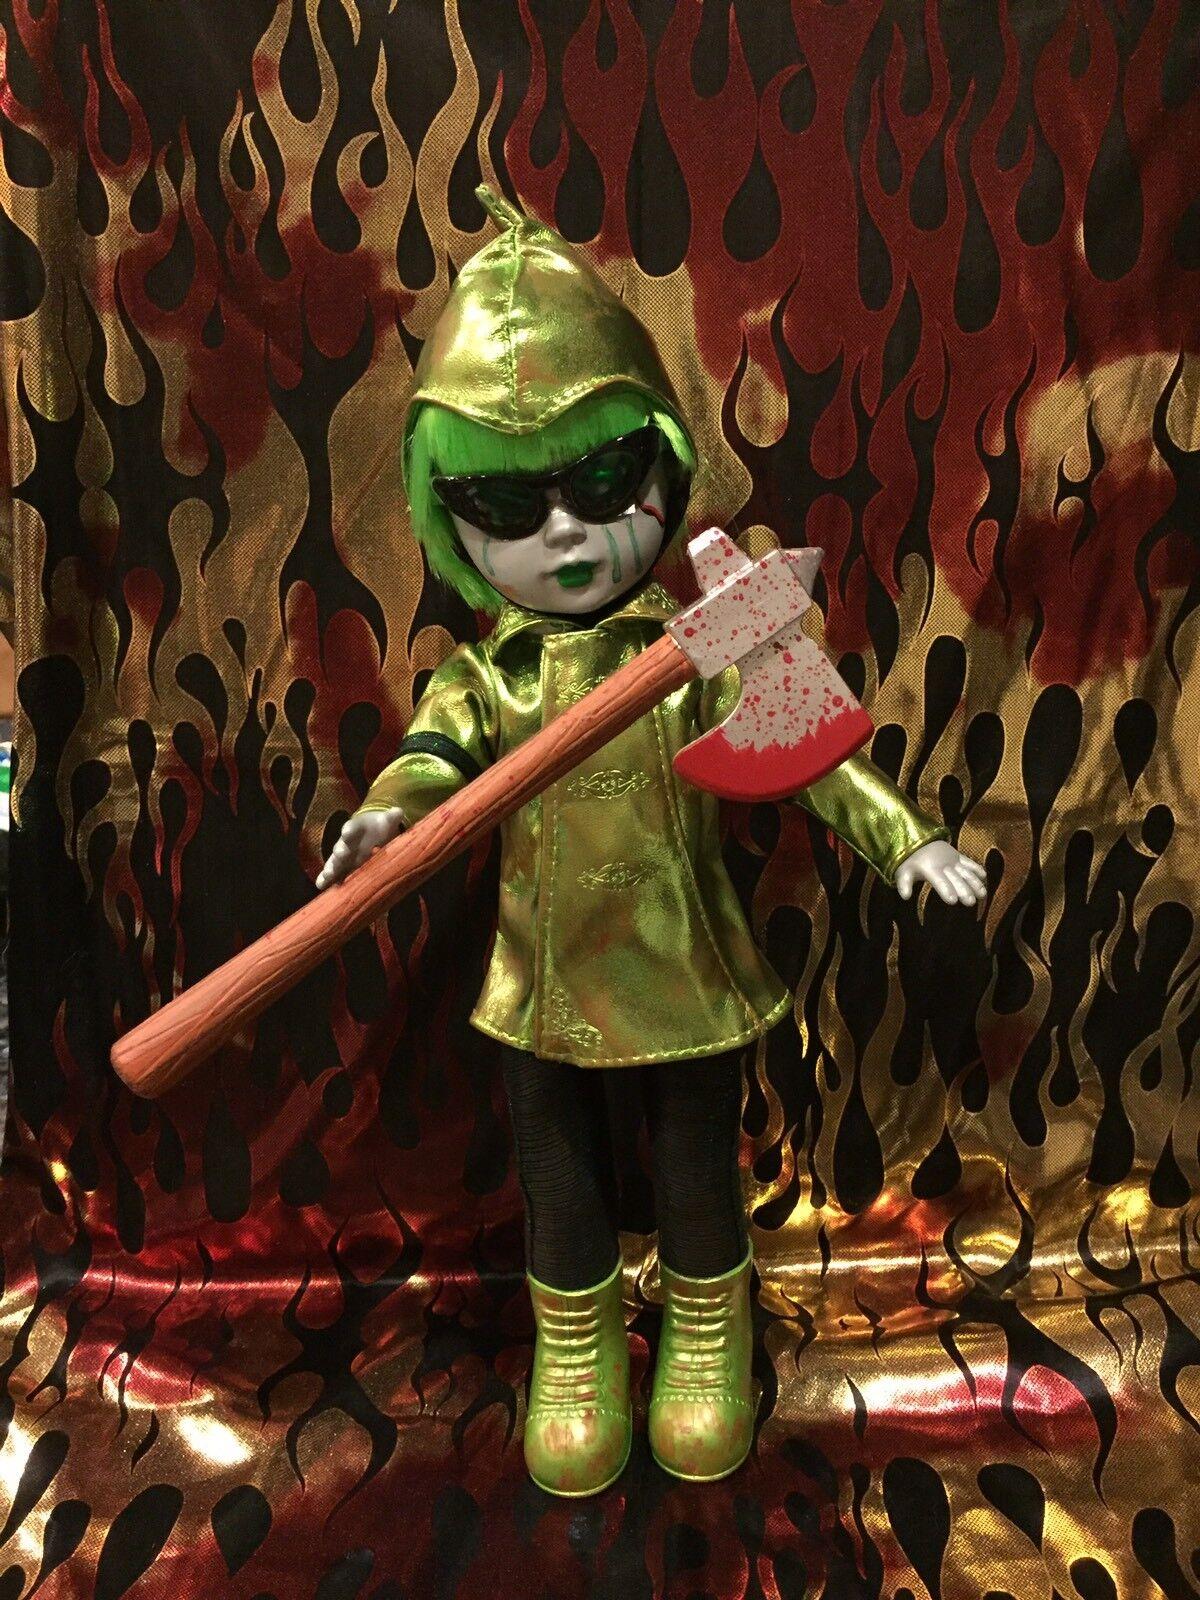 Mezco Toyz Living Dead Dolls Mago de Oz variantes Edición Limitada Envío Gratis